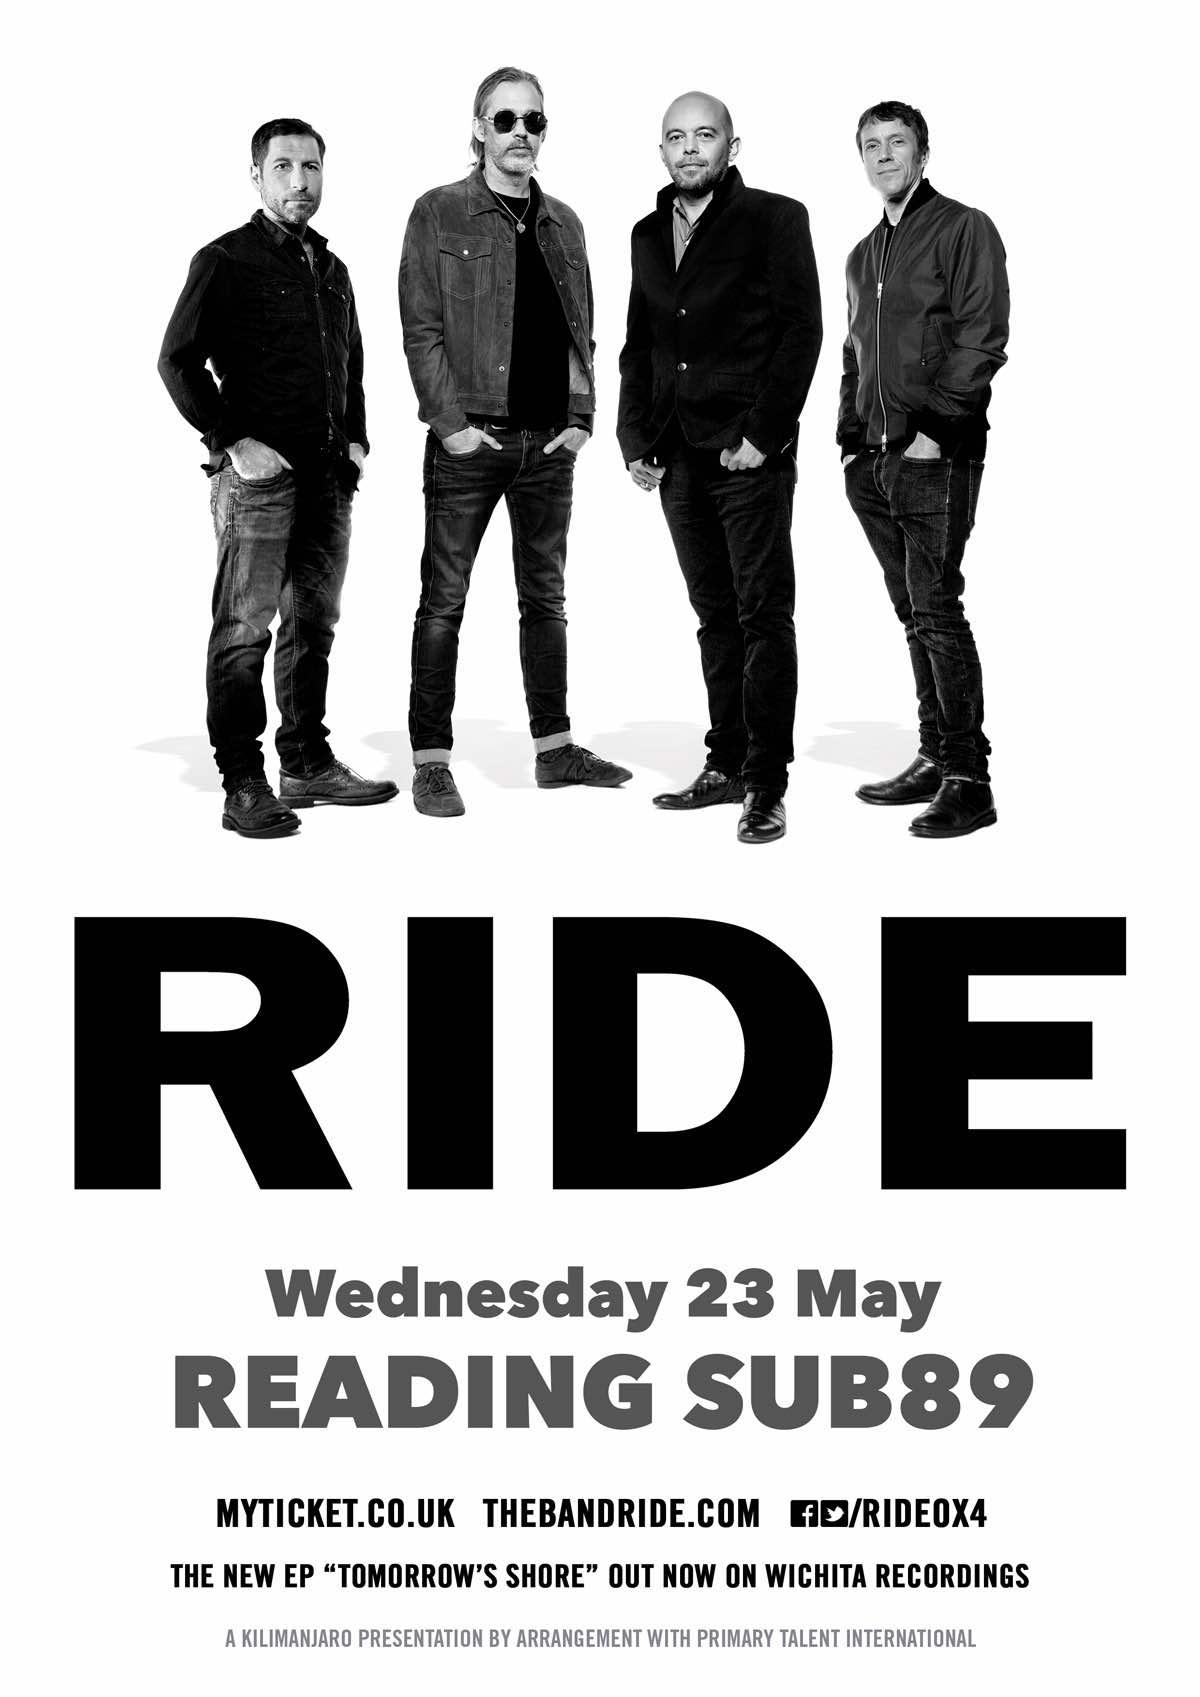 Sub 89 poster